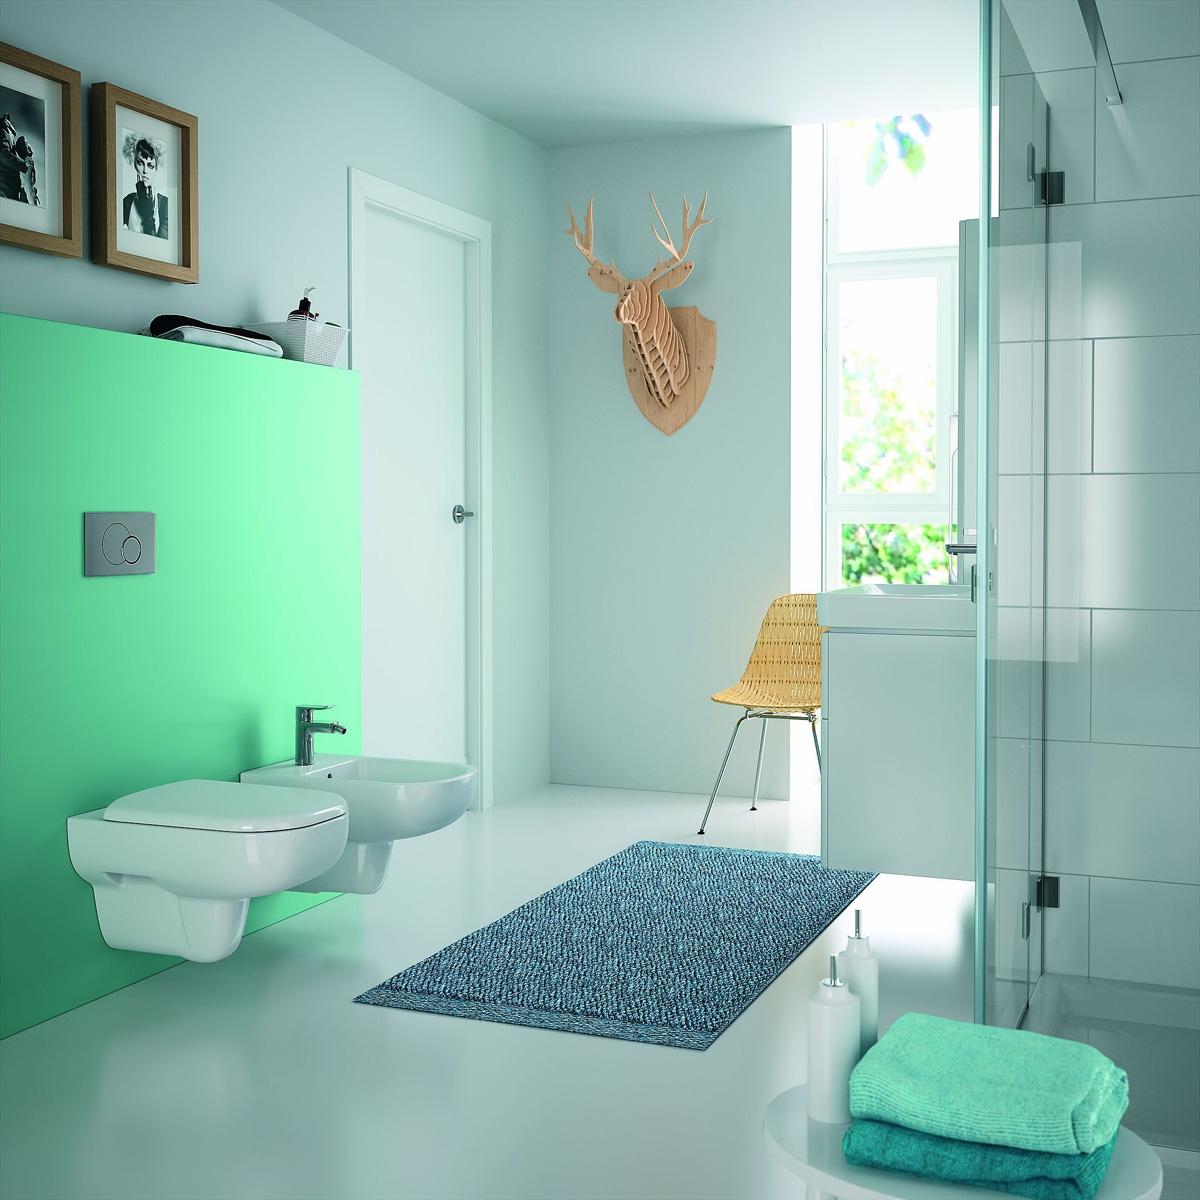 wc suspendu rimfree keramag induscabel salle de bains chauffage et cuisine. Black Bedroom Furniture Sets. Home Design Ideas